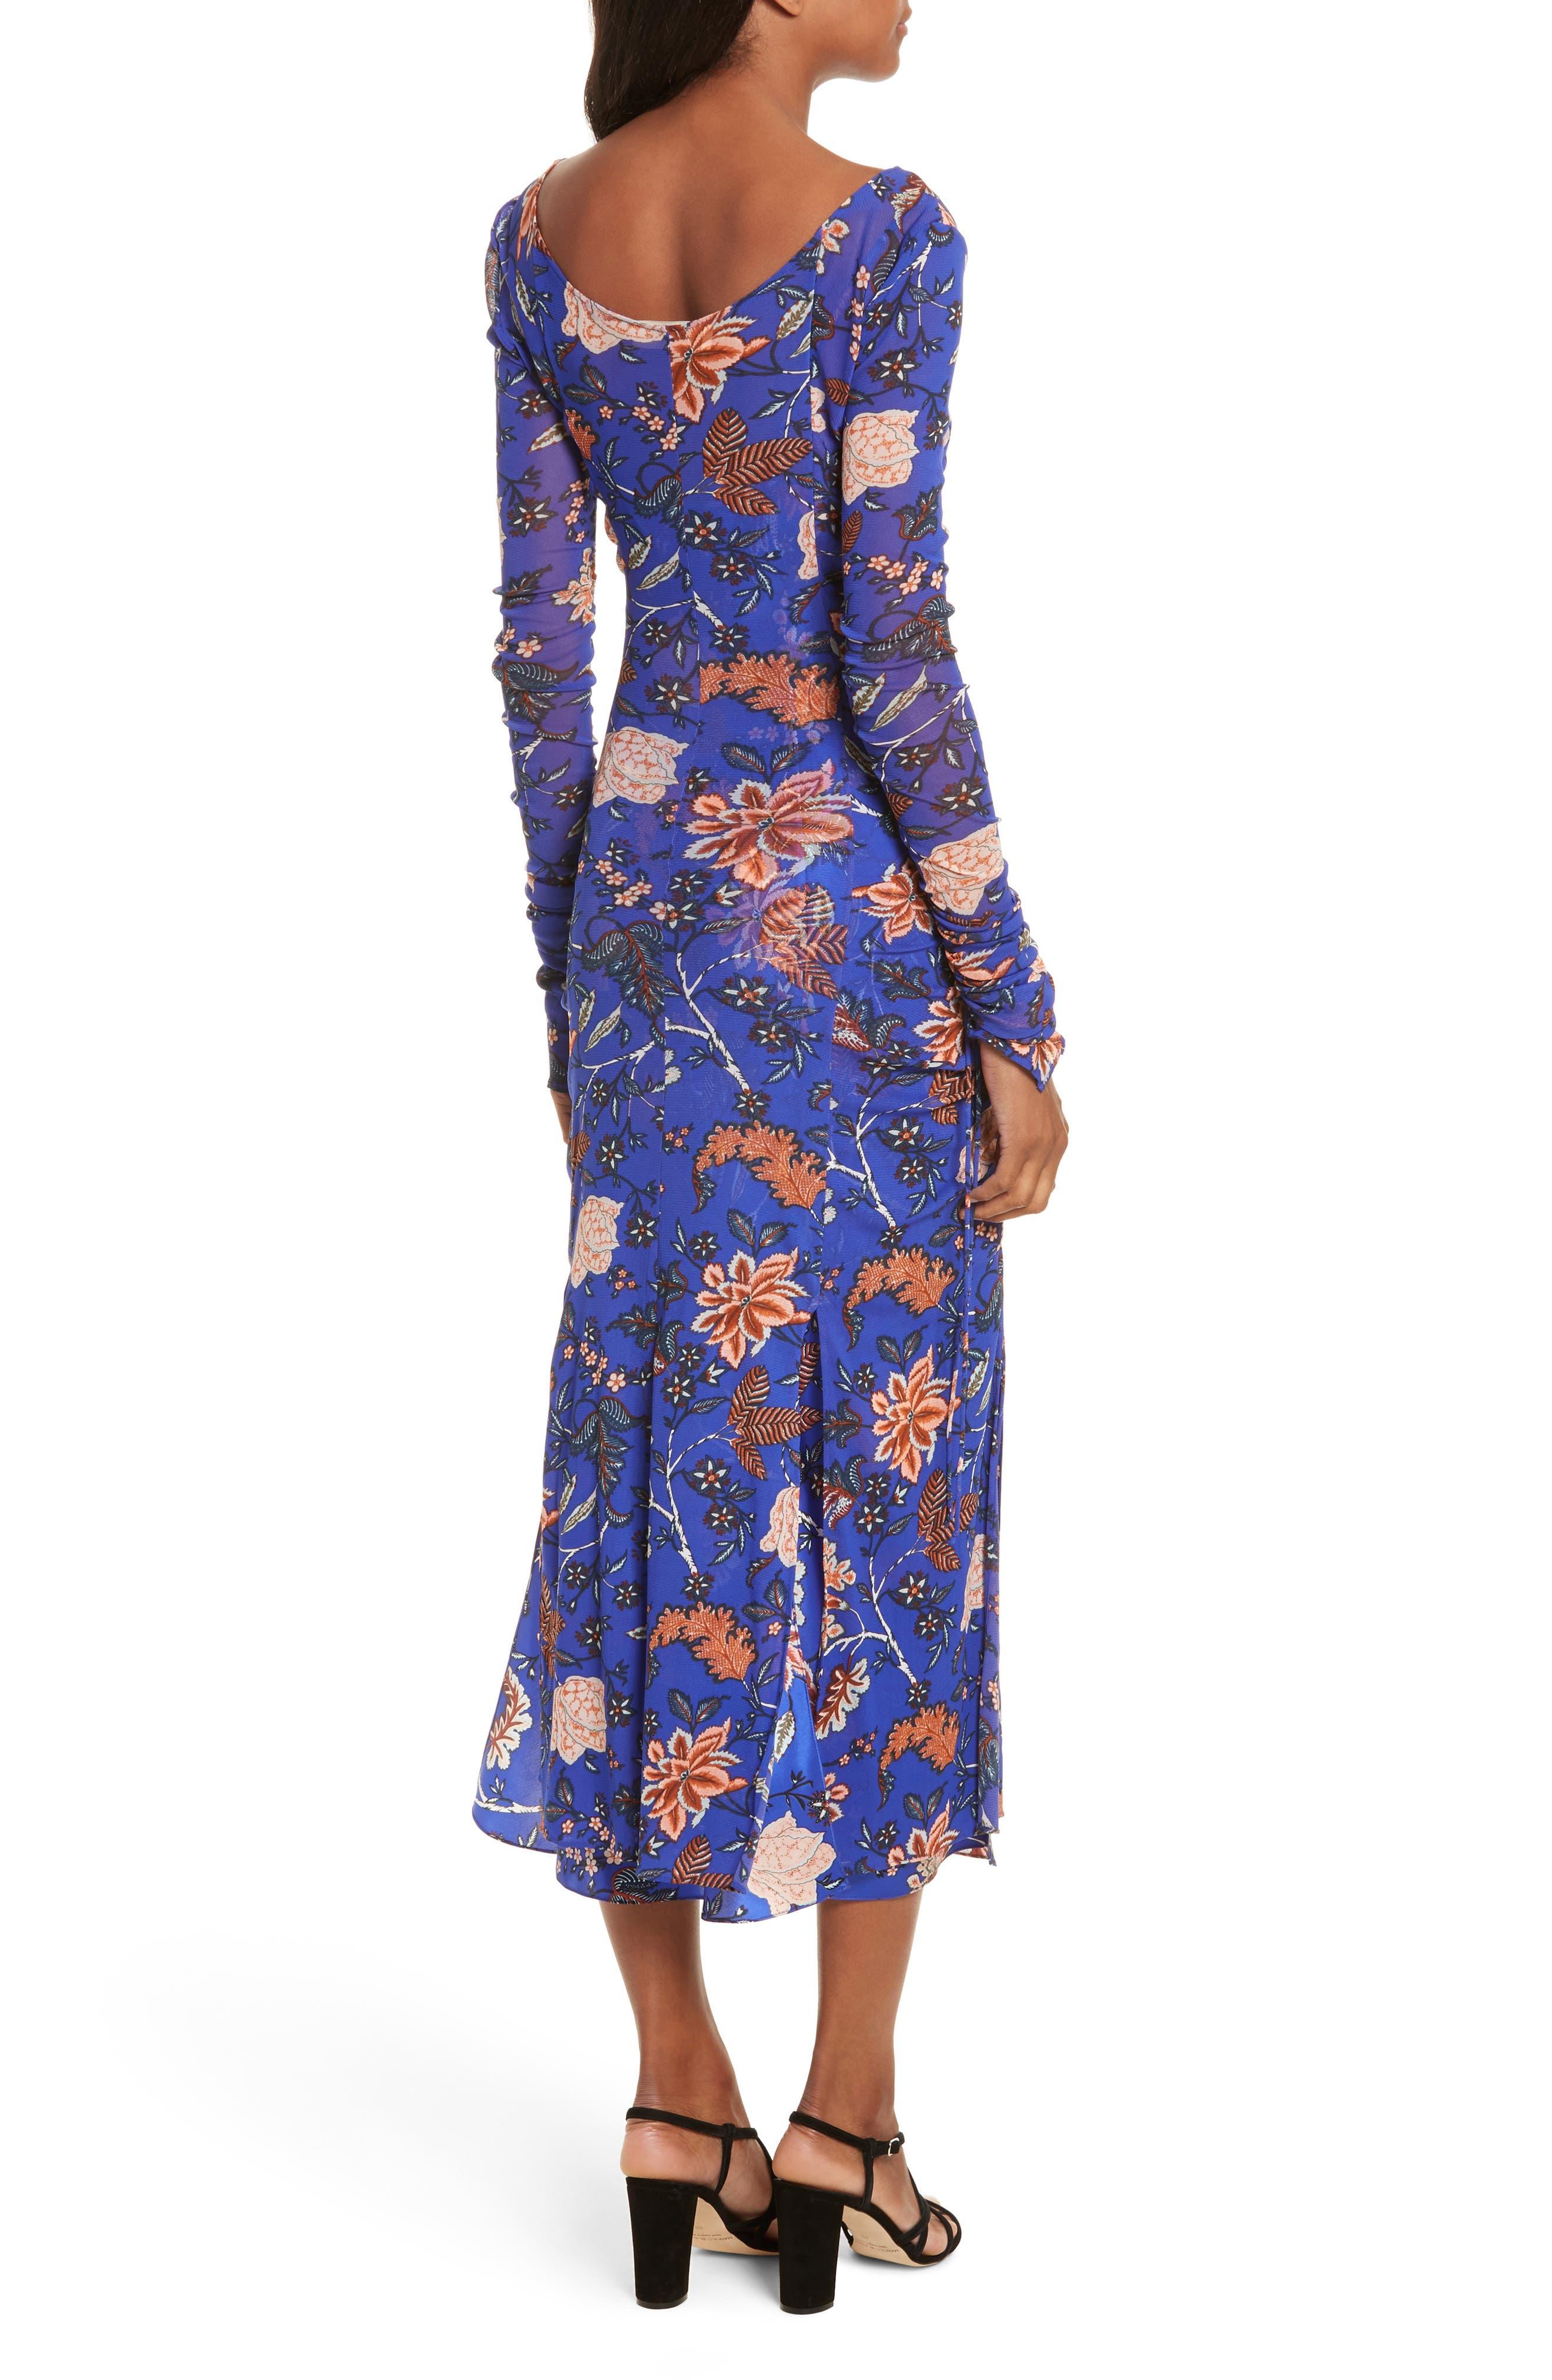 Diane von Furstenberg Mesh Overlay Floral Midi Dress,                             Alternate thumbnail 2, color,                             533